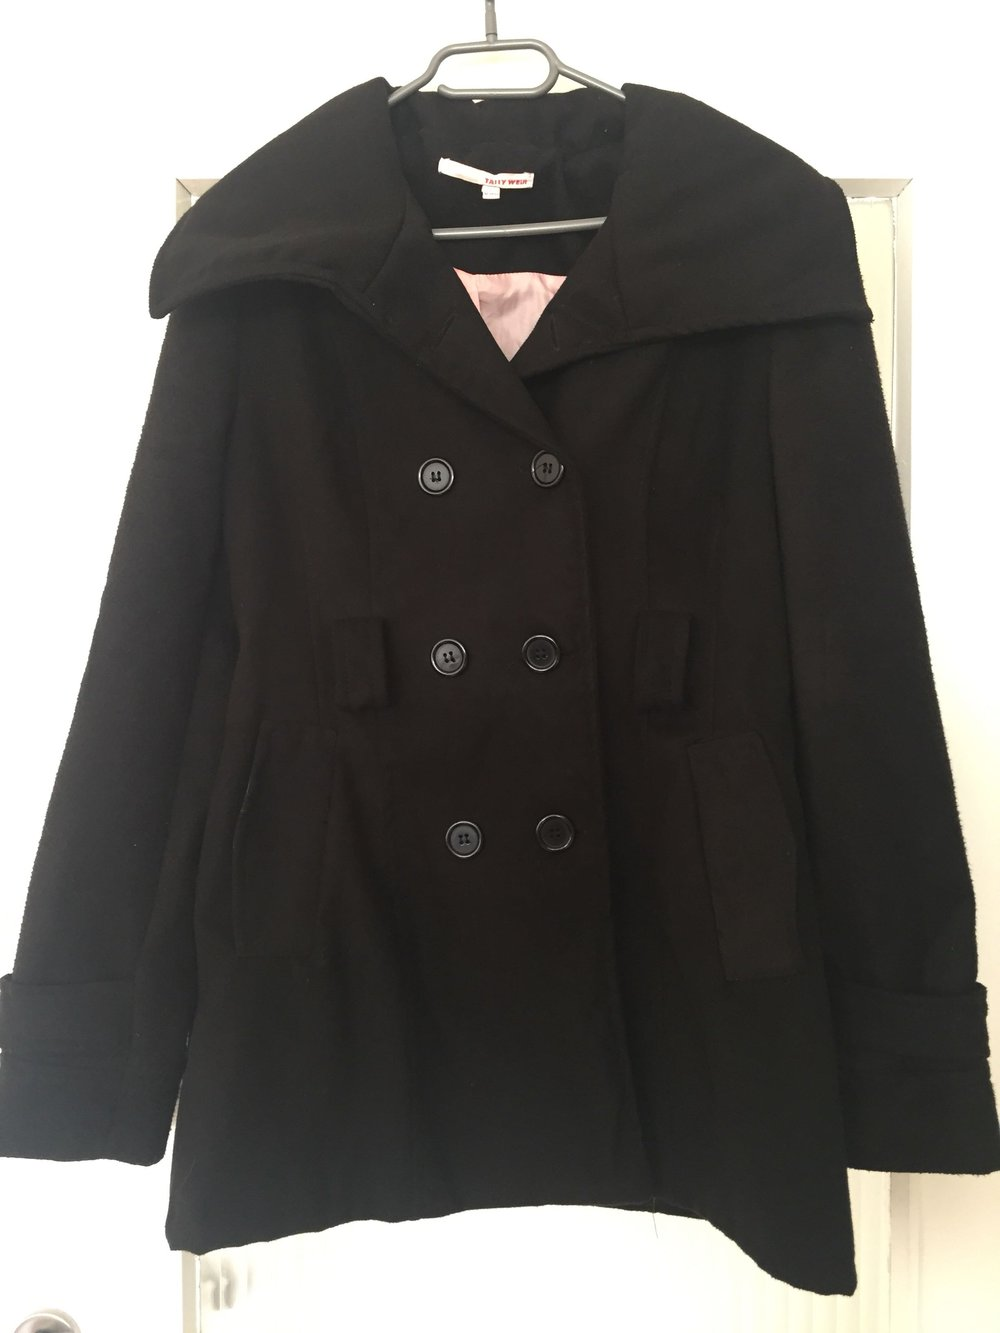 Tally weijl mantel schwarz